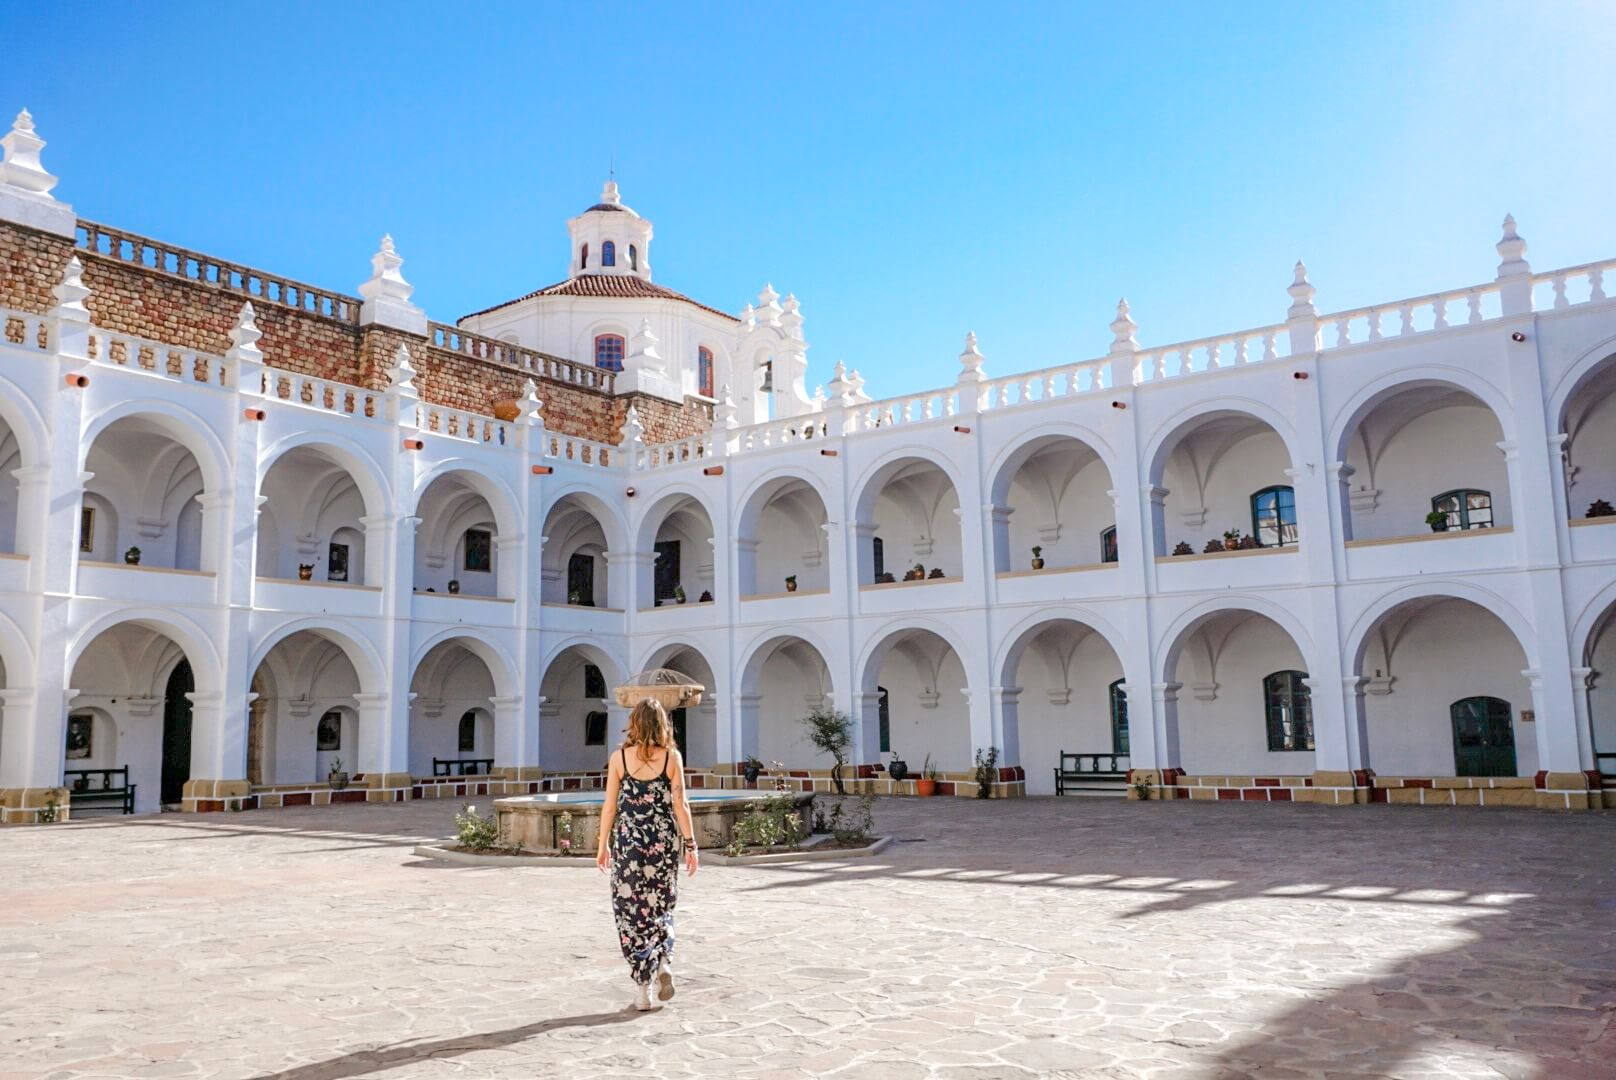 couvent iglesia san felipe de neri sucre à visiter